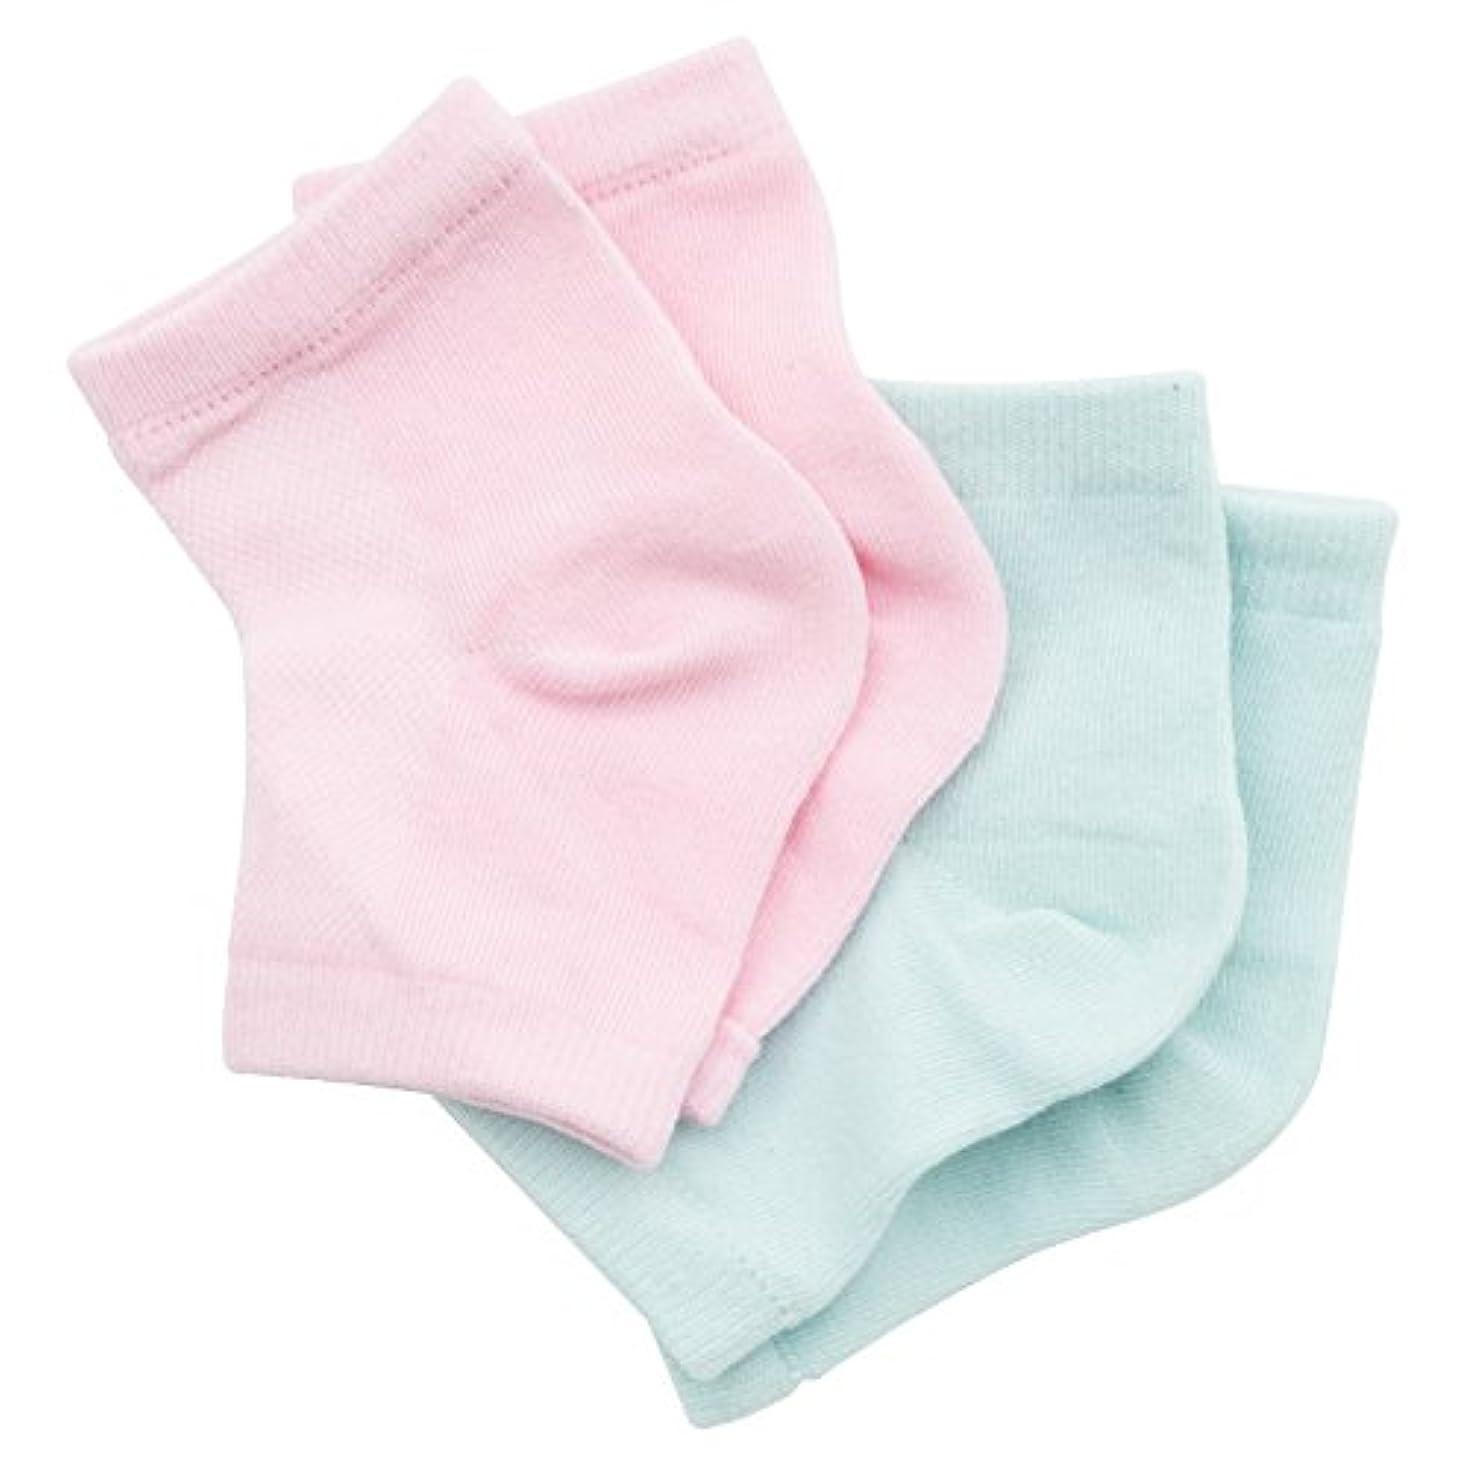 Viaura(ヴィオーラ) かかと 靴下 ソックス 角質ケア 滑らか スベスベ ツルツル うるおい 保湿 美容 ひび フットケア パック 洗える レディース メンズ 男女兼用 フリーサイズ 2足セット